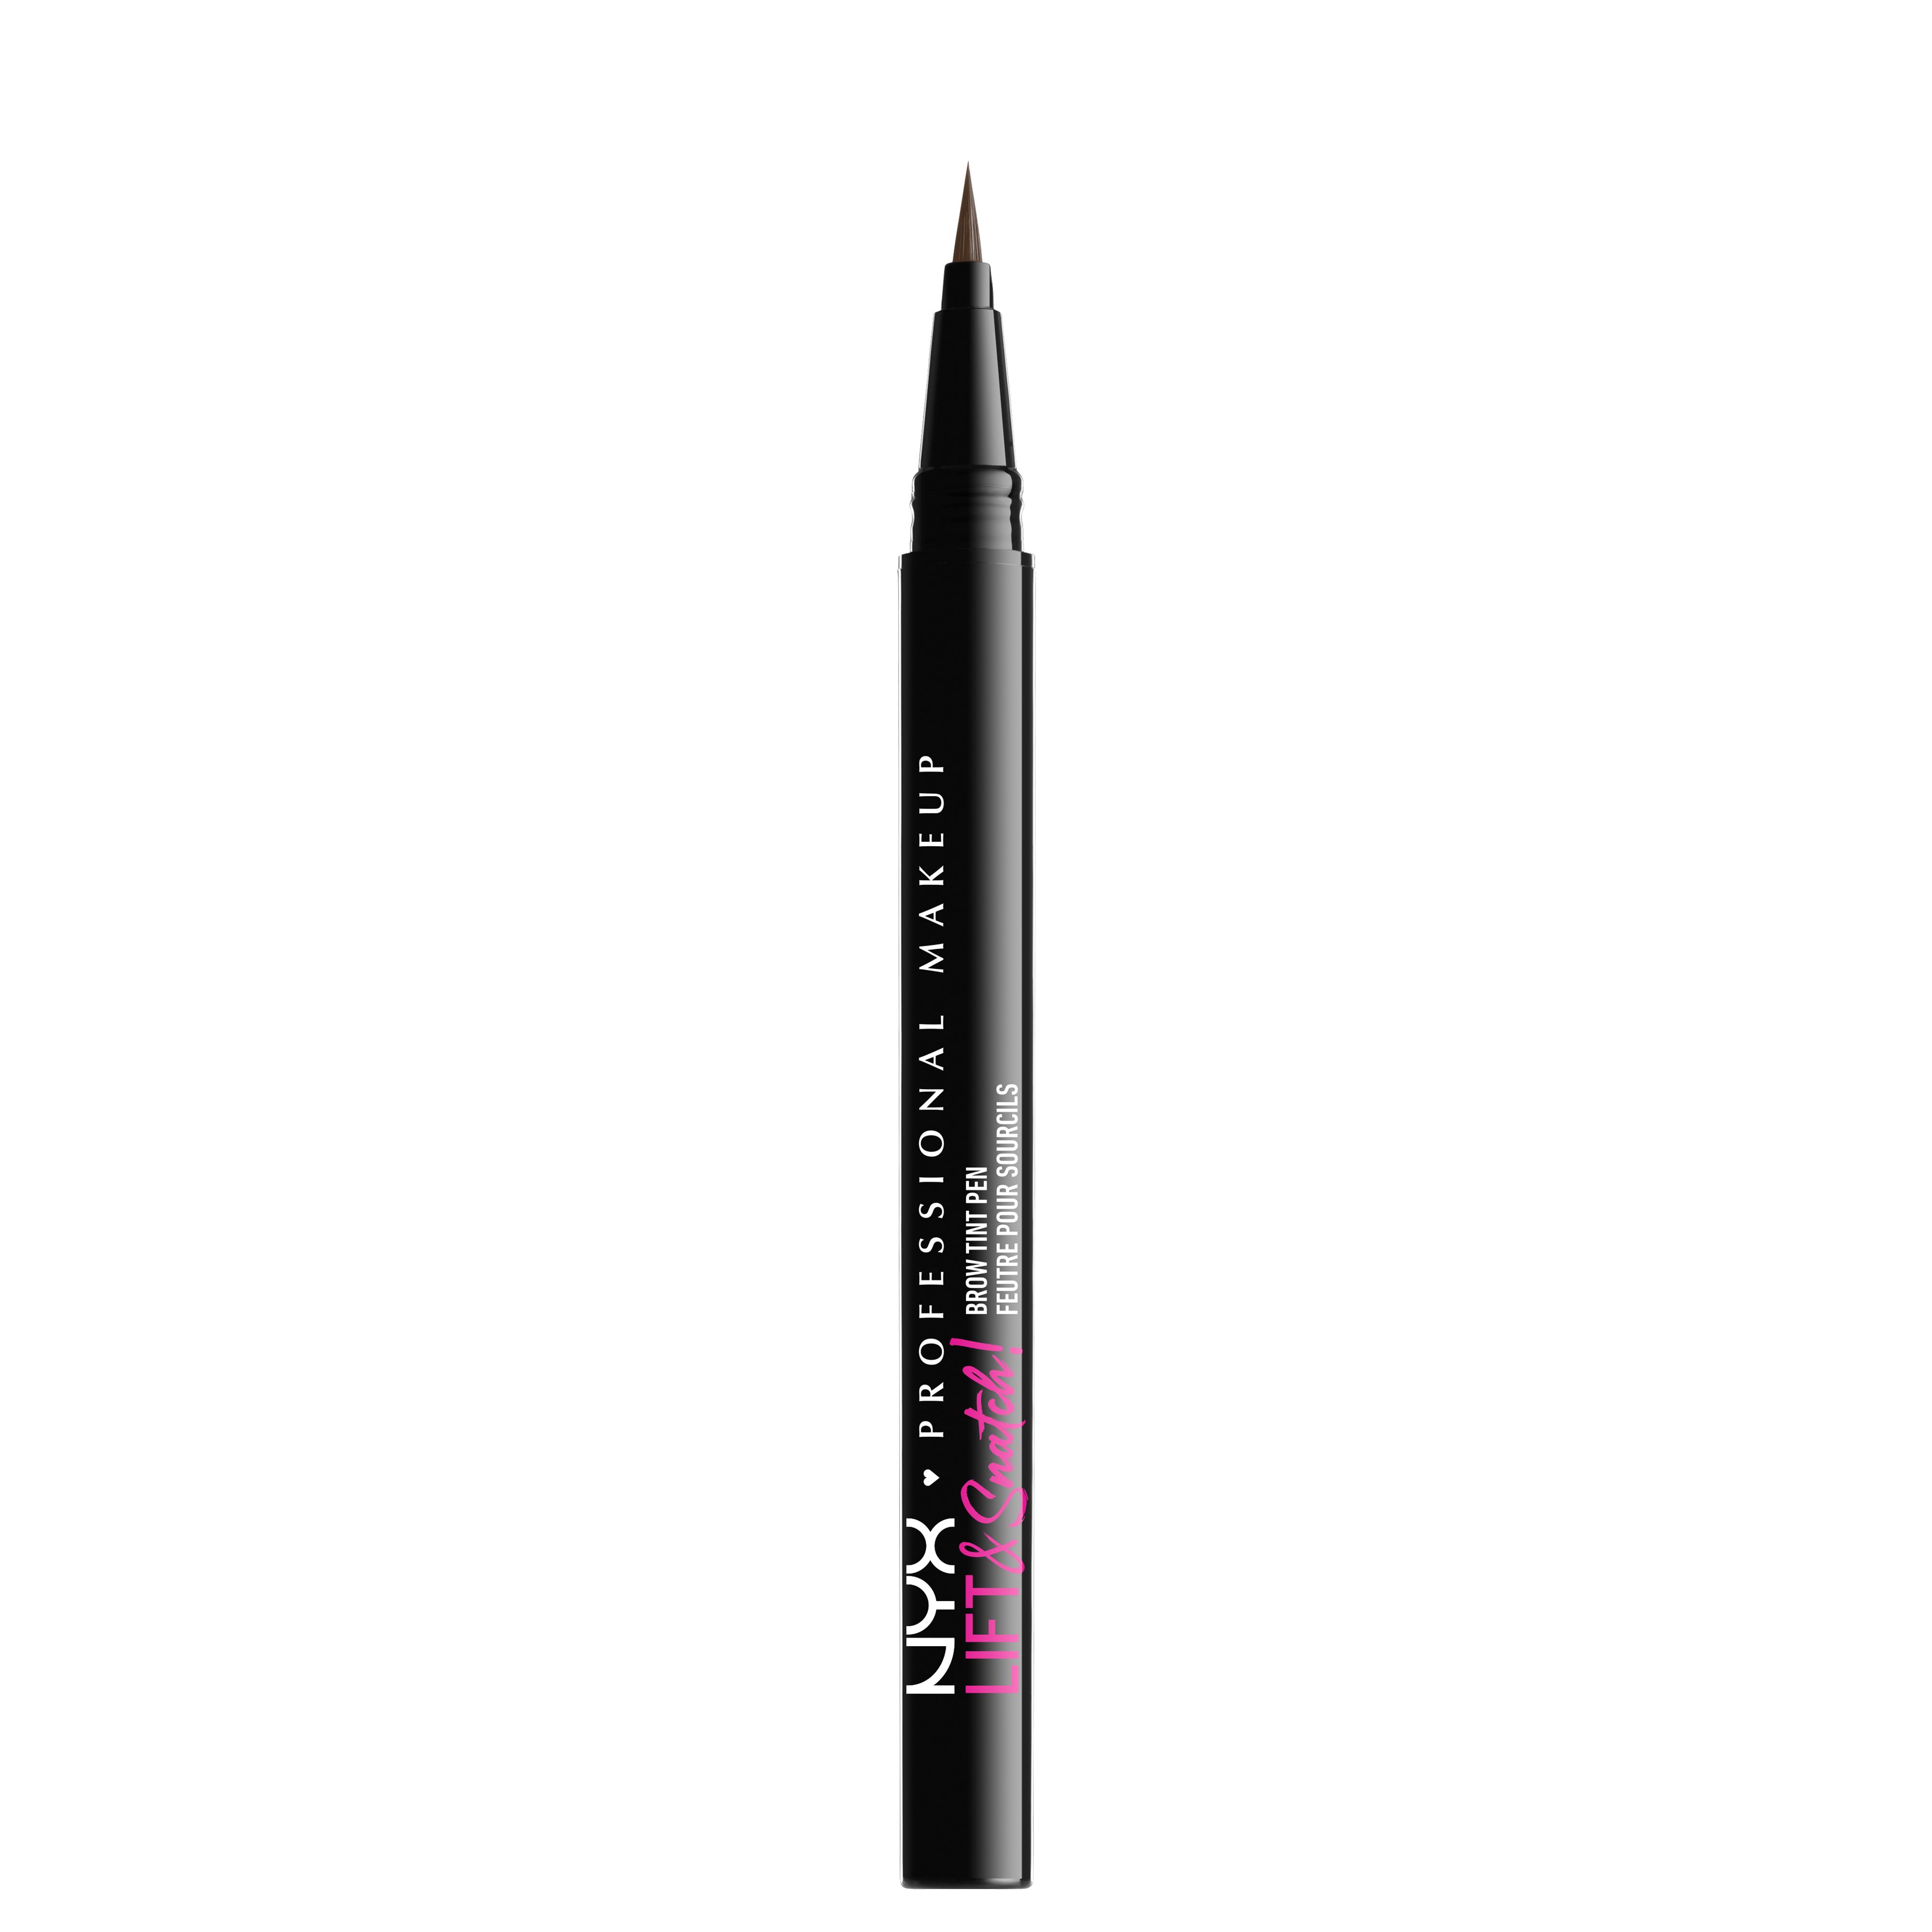 NYX Professional Makeup - Lift & Snatch! Brow Tint Pen - Ash Brown